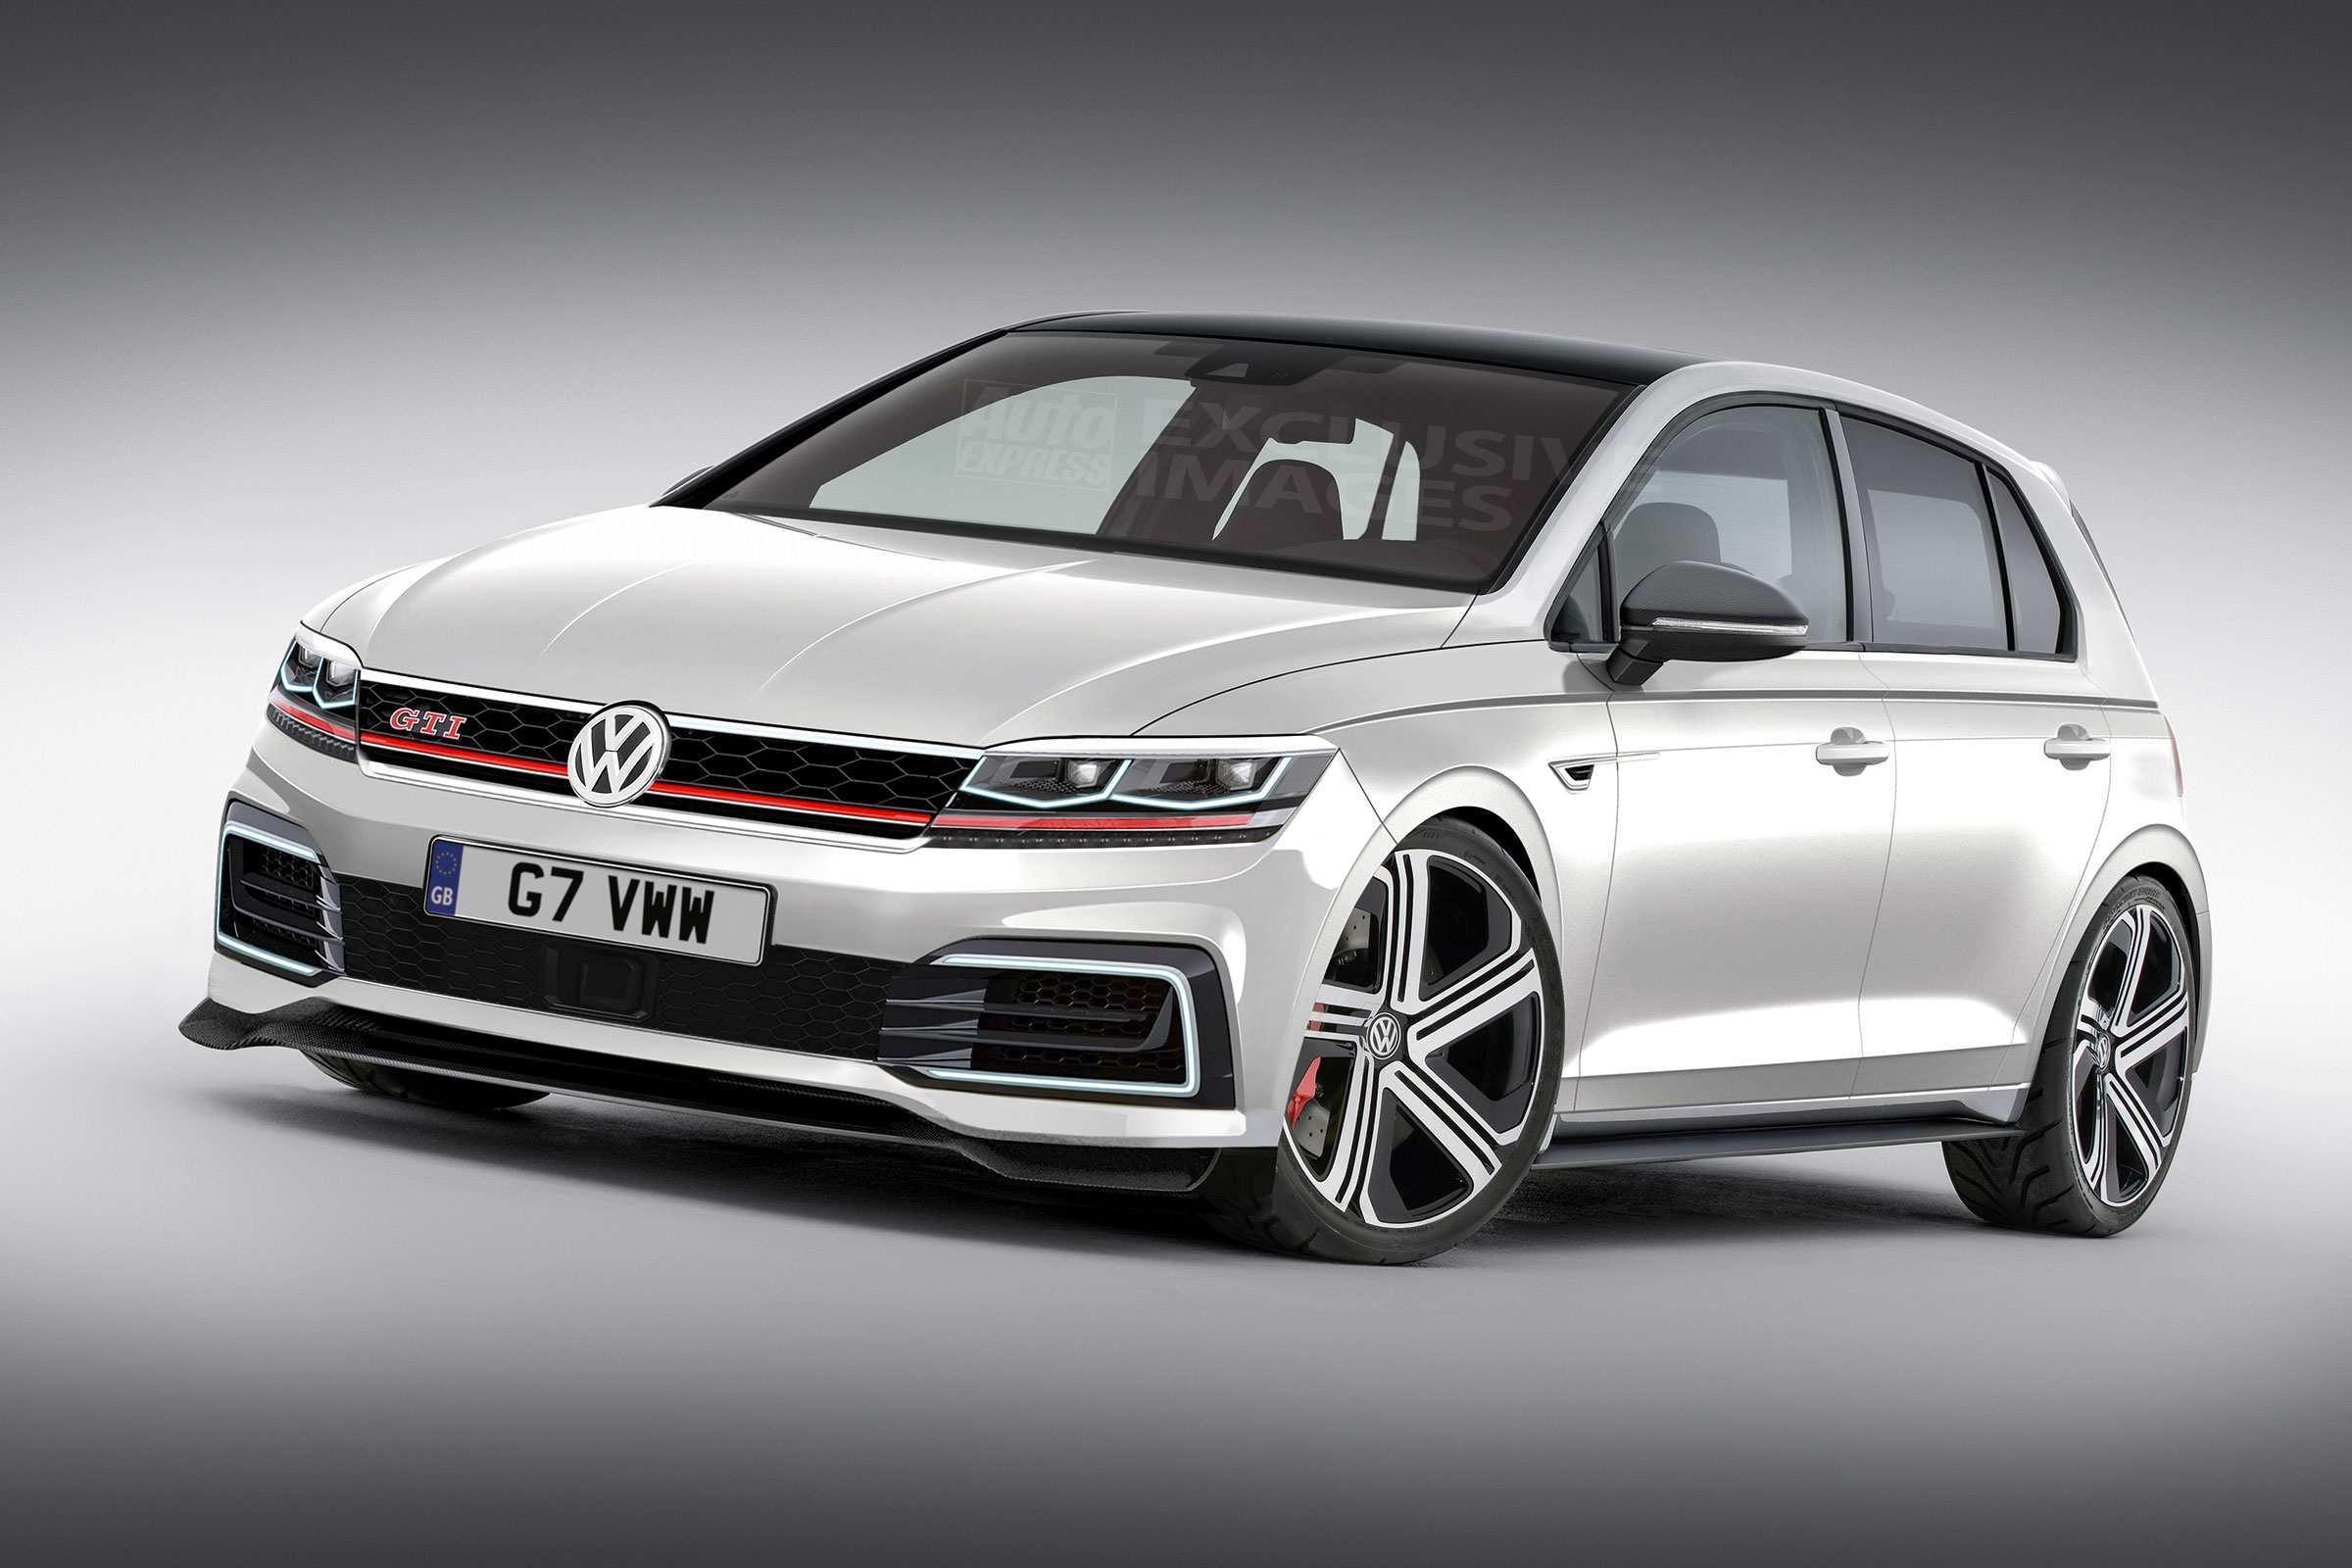 29 All New 2019 Volkswagen Gti Release Date Rumors with 2019 Volkswagen Gti Release Date